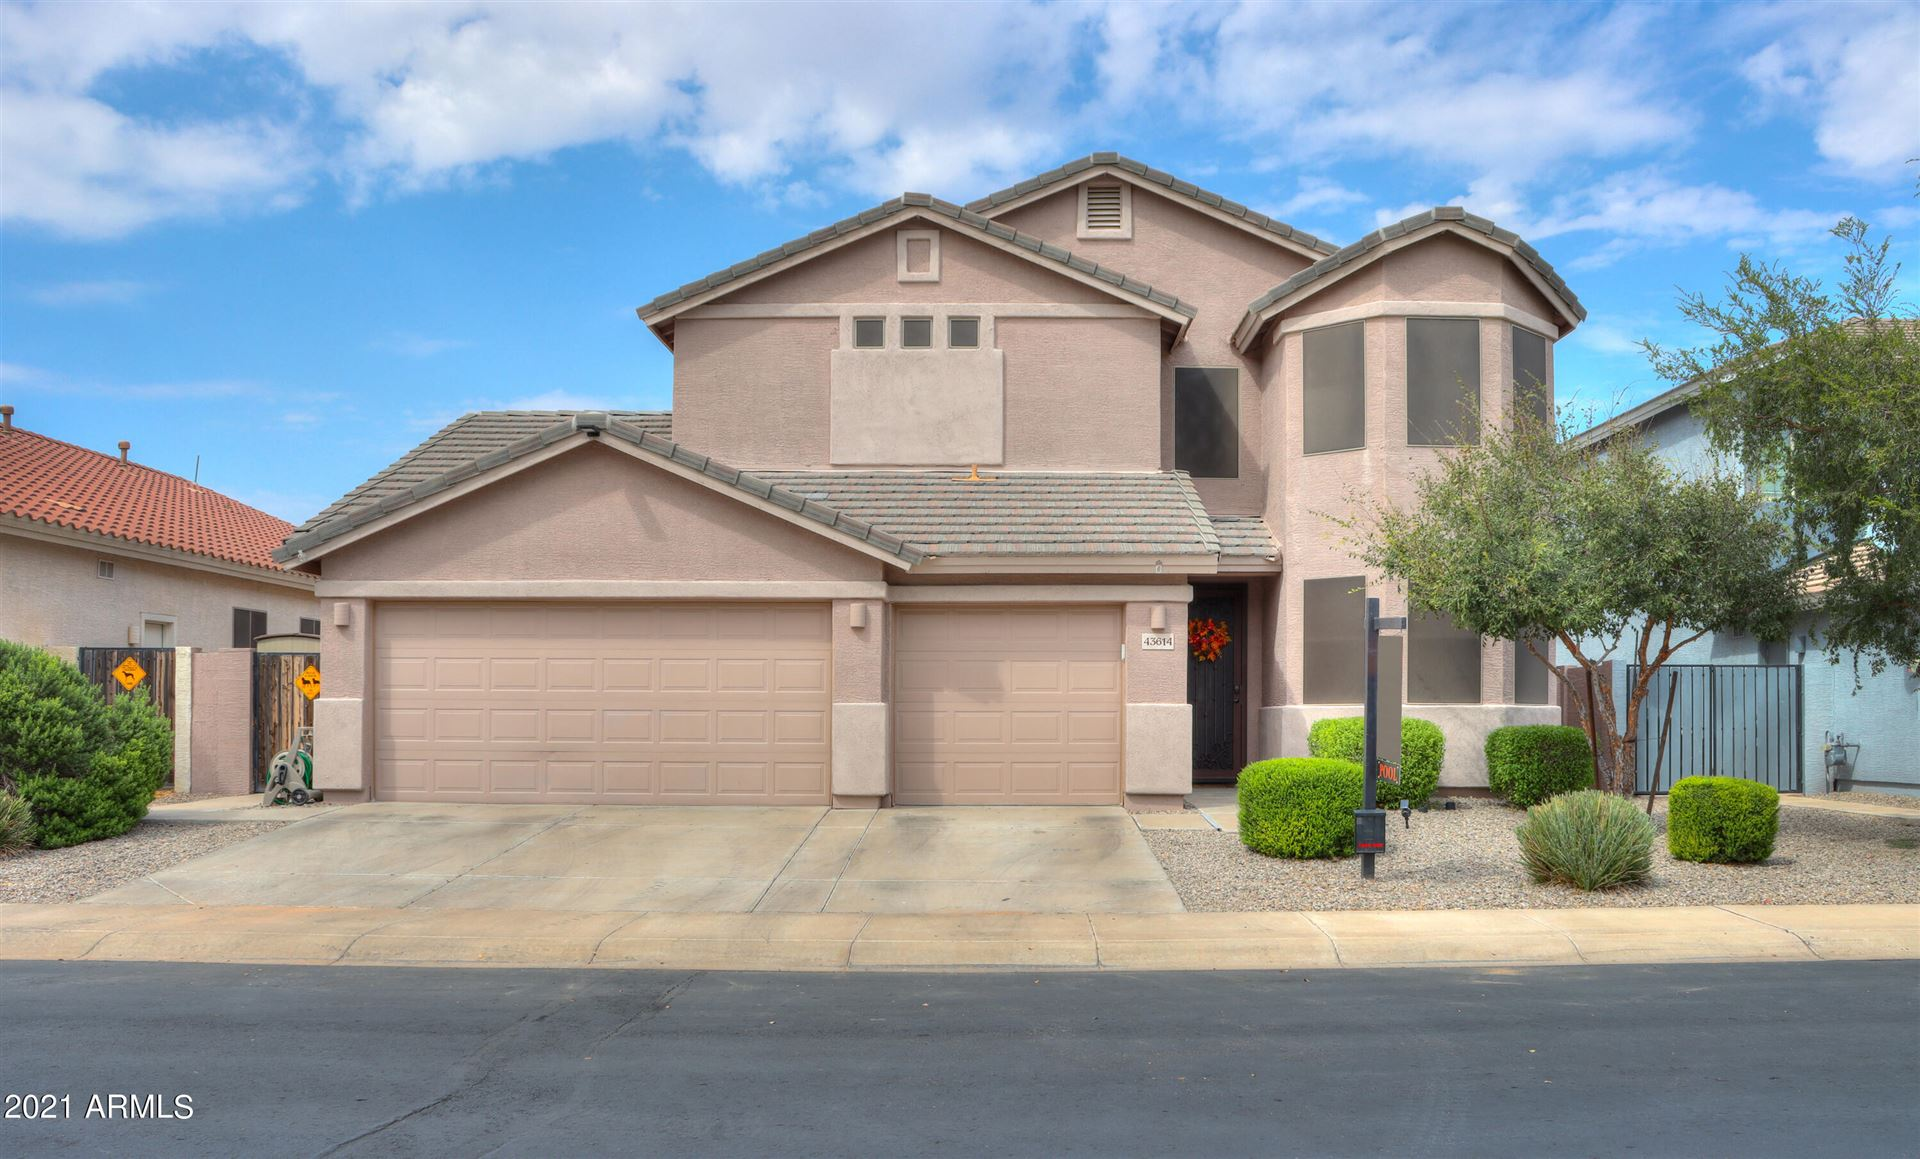 Photo of 43614 W CYDNEE Drive, Maricopa, AZ 85138 (MLS # 6295533)